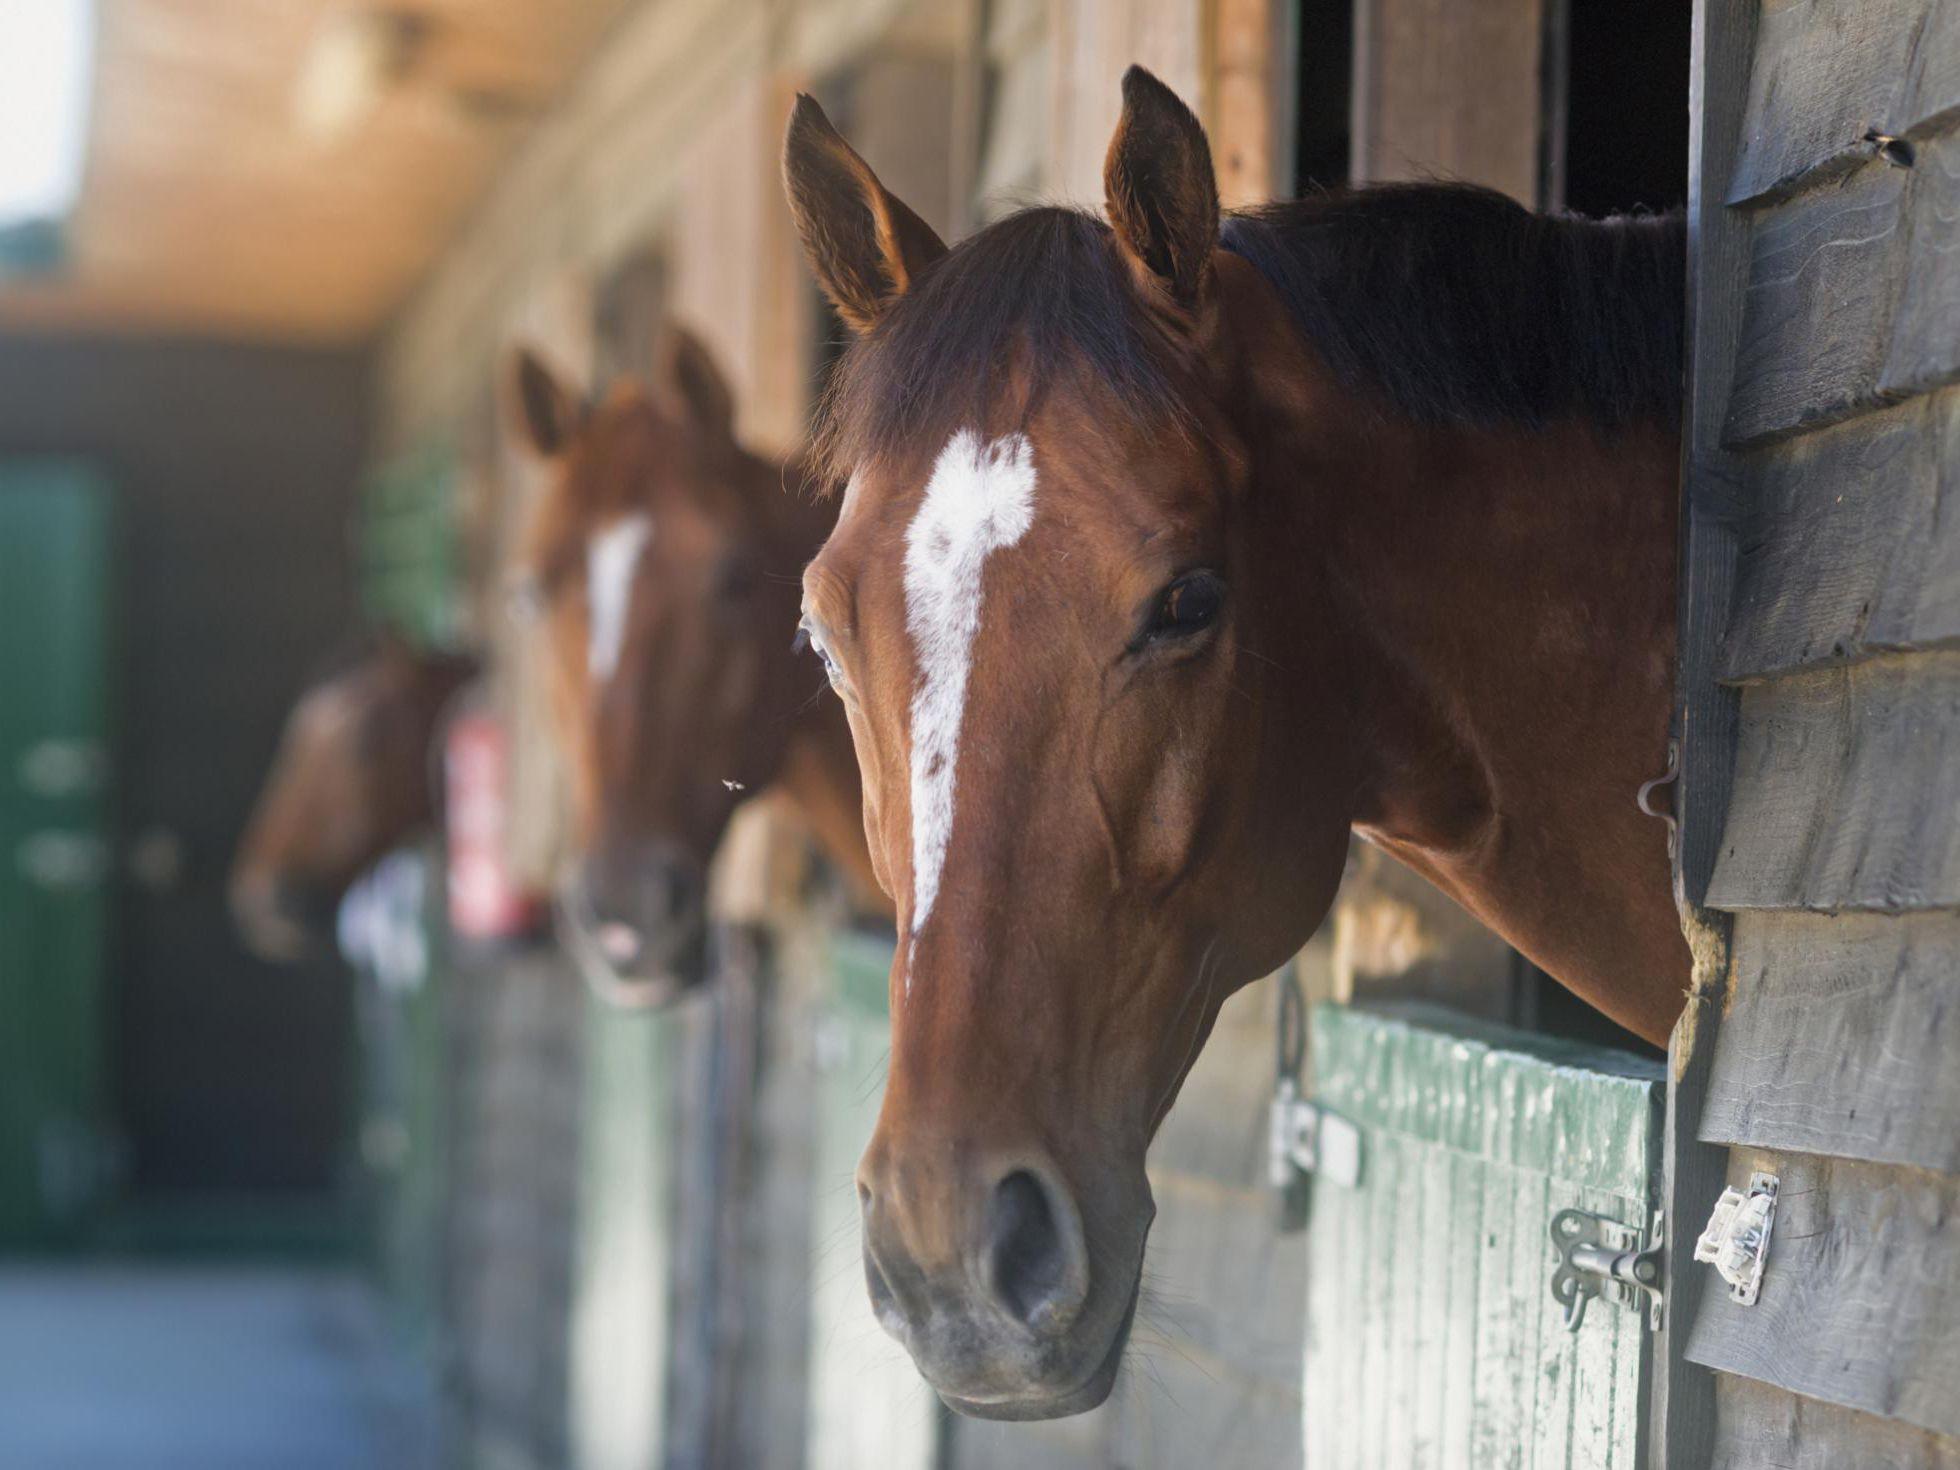 COPD, Broken Wind or Heaves in Horses